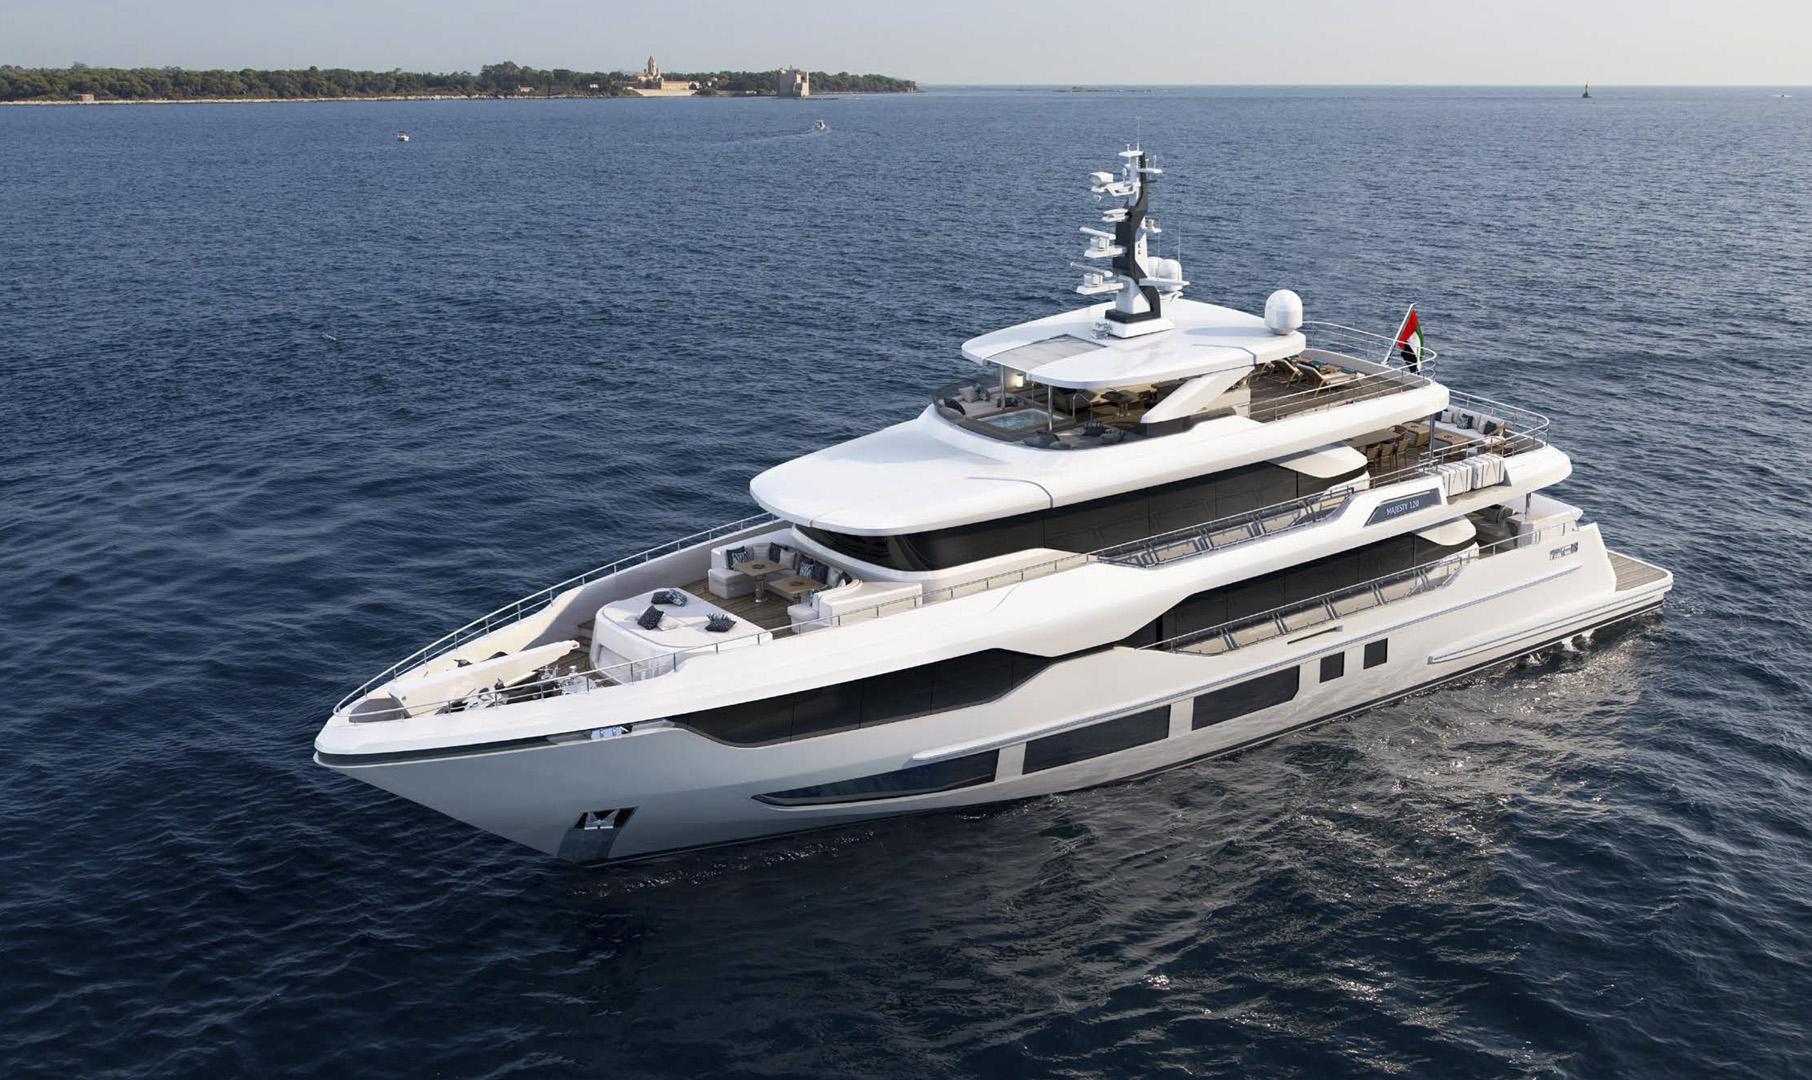 Majesty 120 - Representing the new era of Majesty Yachts